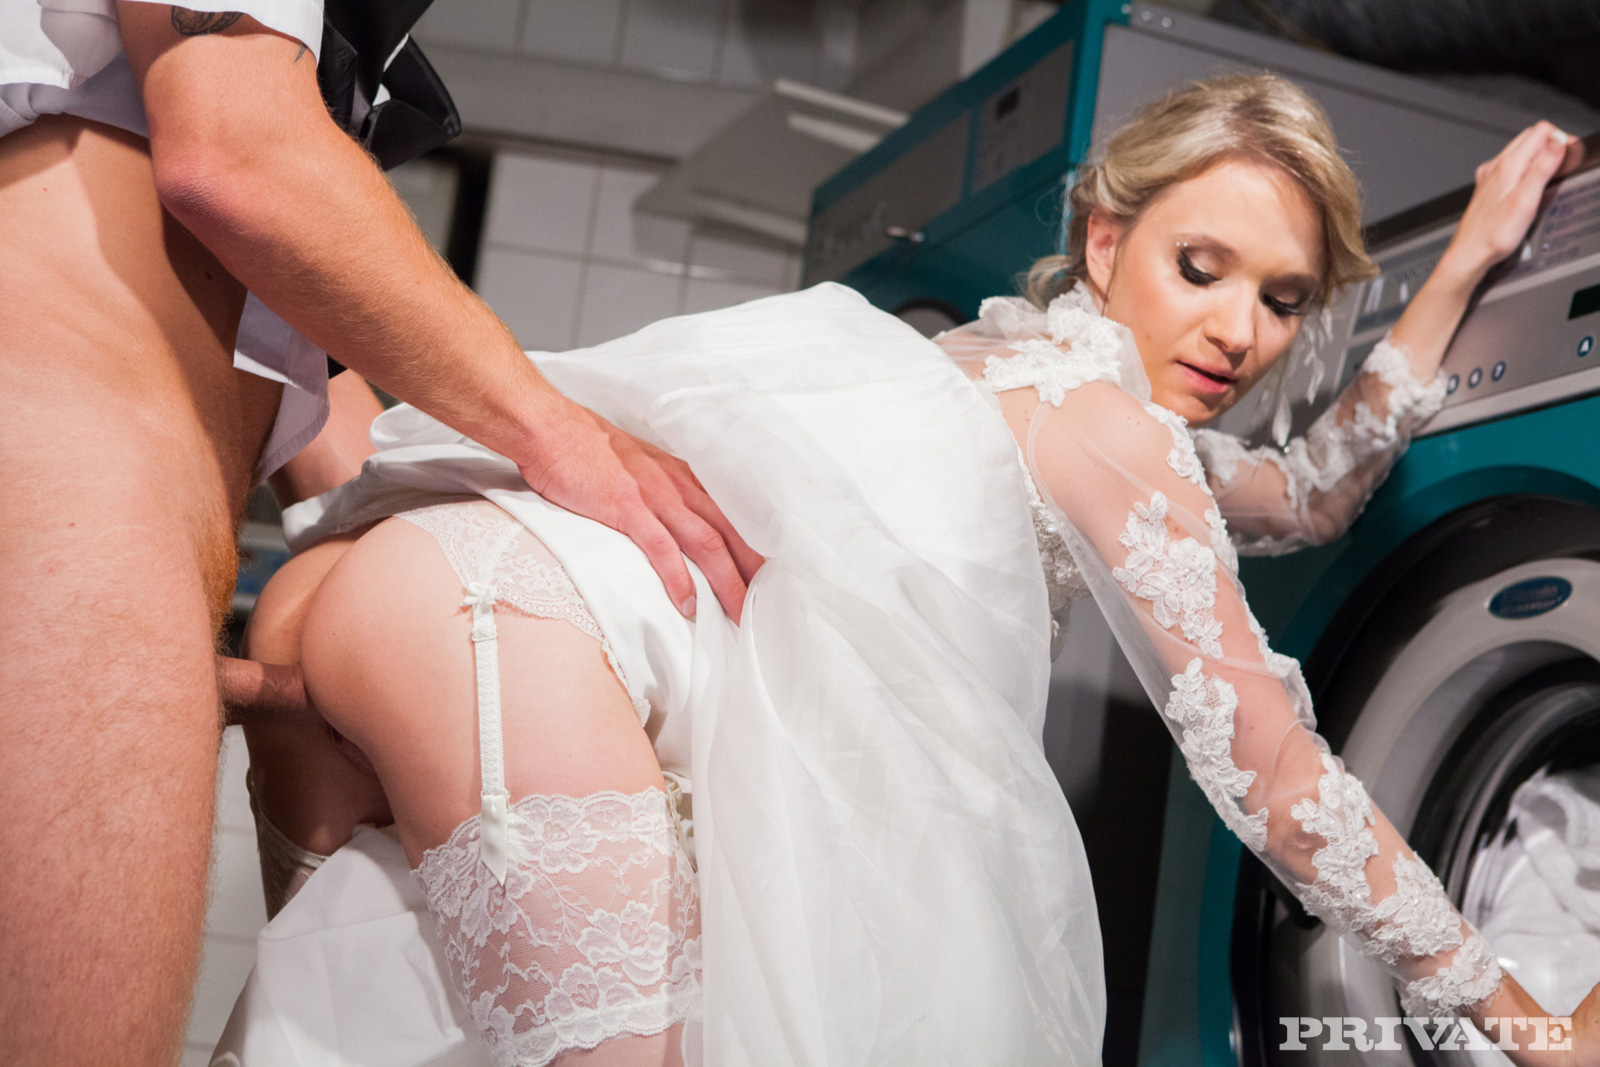 планах невесту трахают на празднике онлайн фильм, который